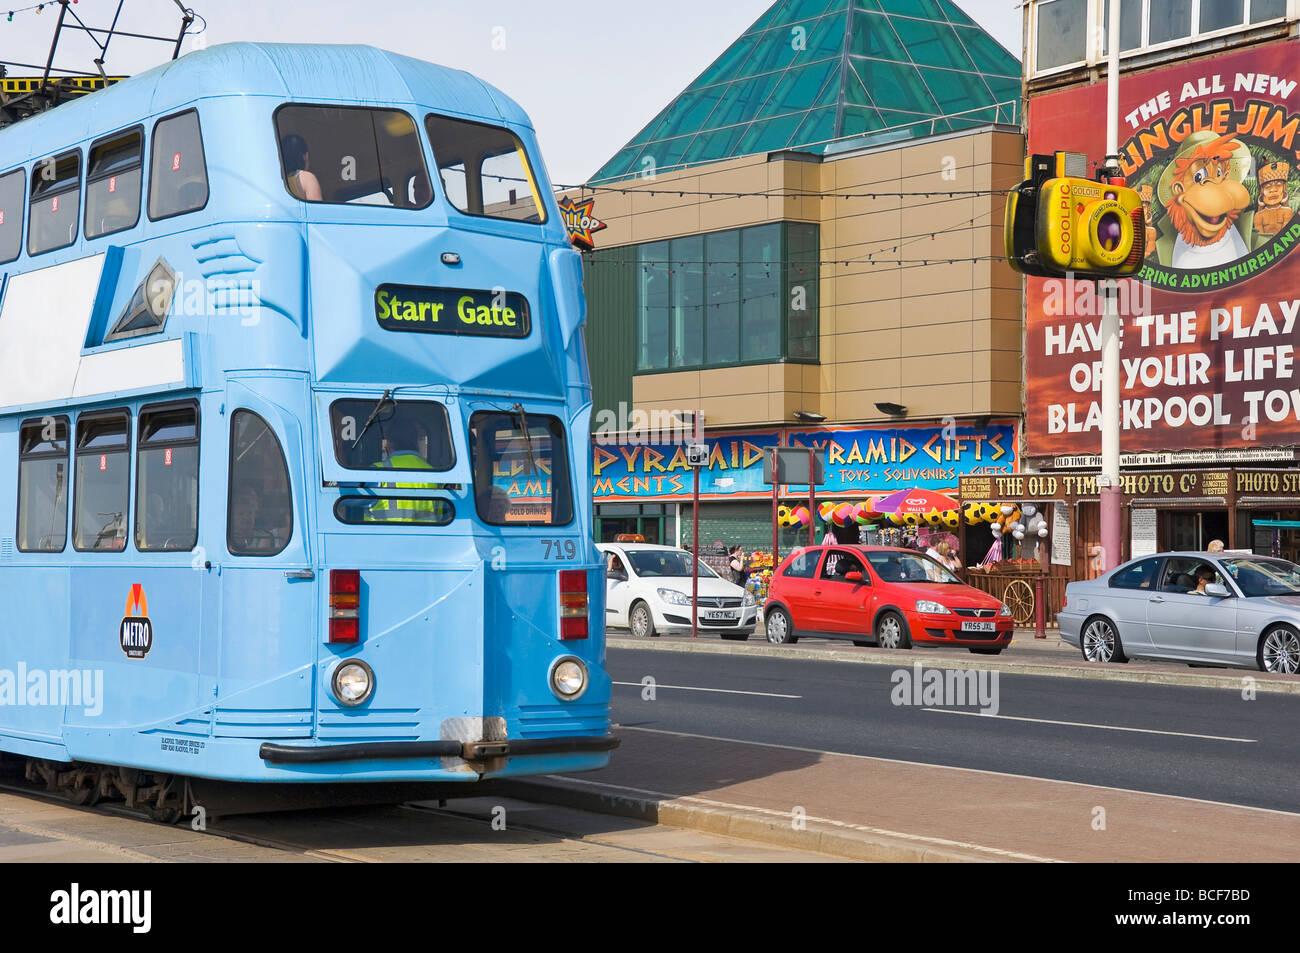 Electric tram travelling along Blackpools golden mile Lancashire England UK United Kingdom GB Great Britain - Stock Image